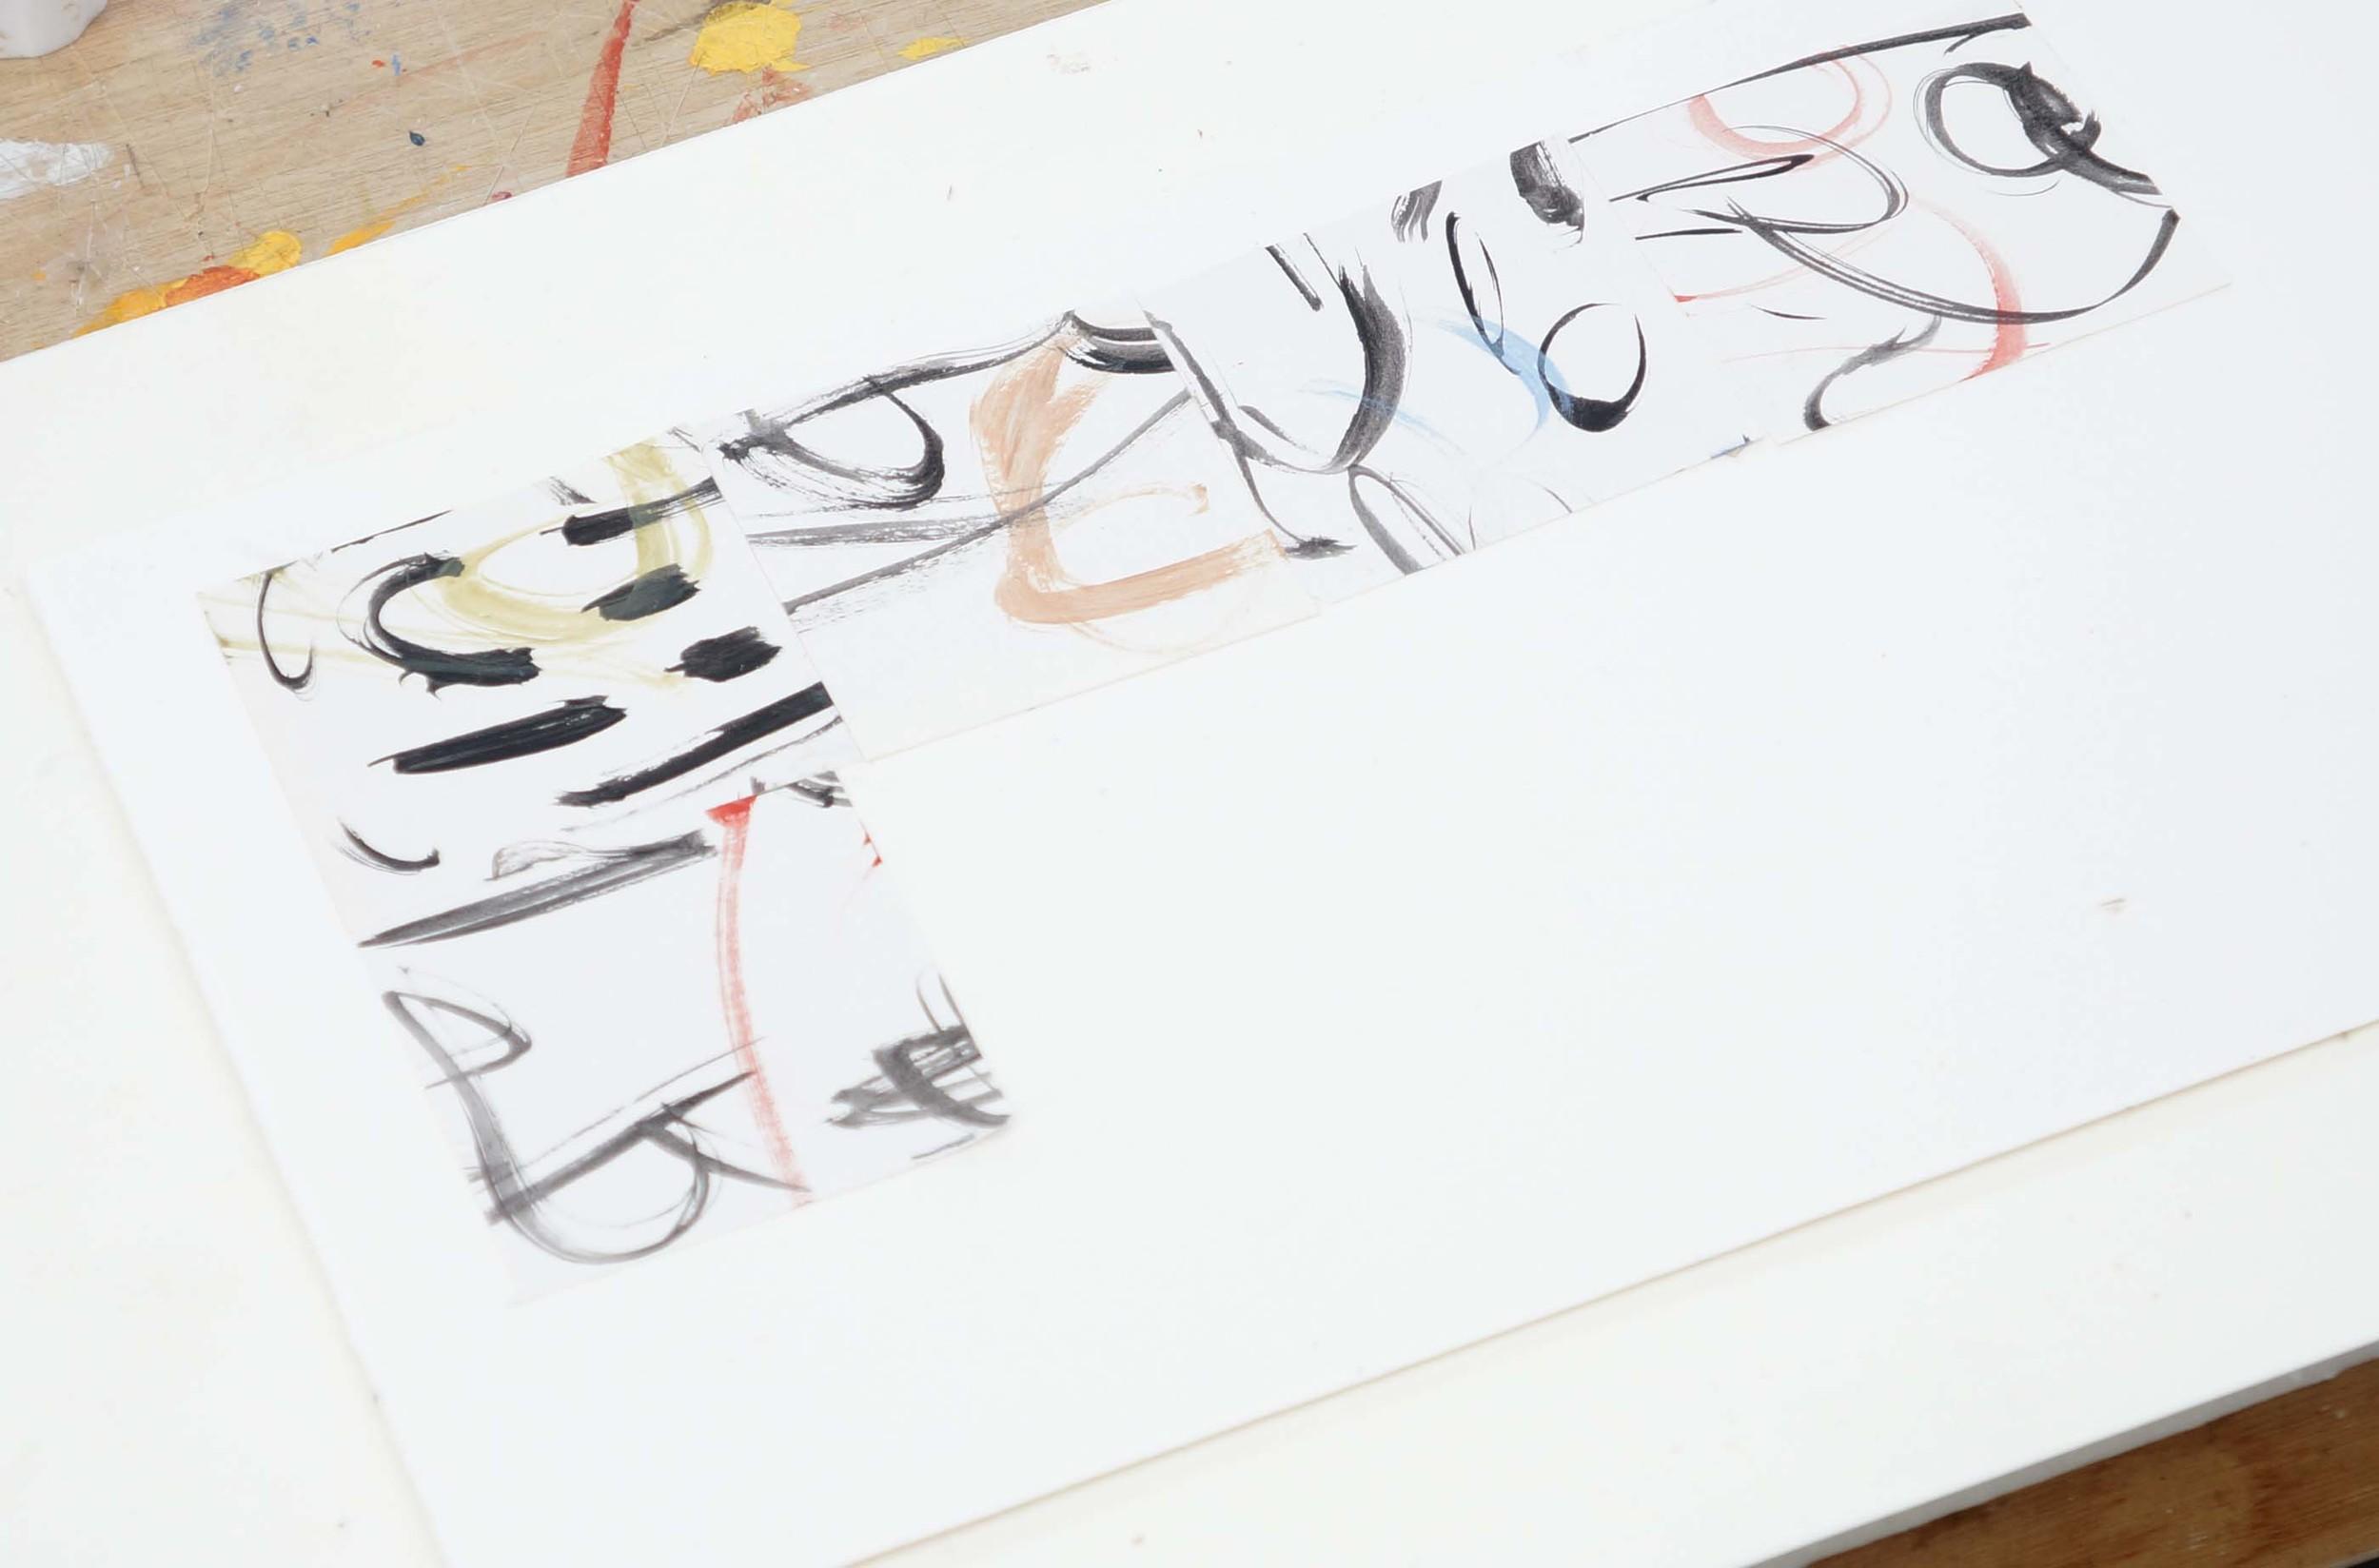 site-2-21-14 callligraphy 4.jpg